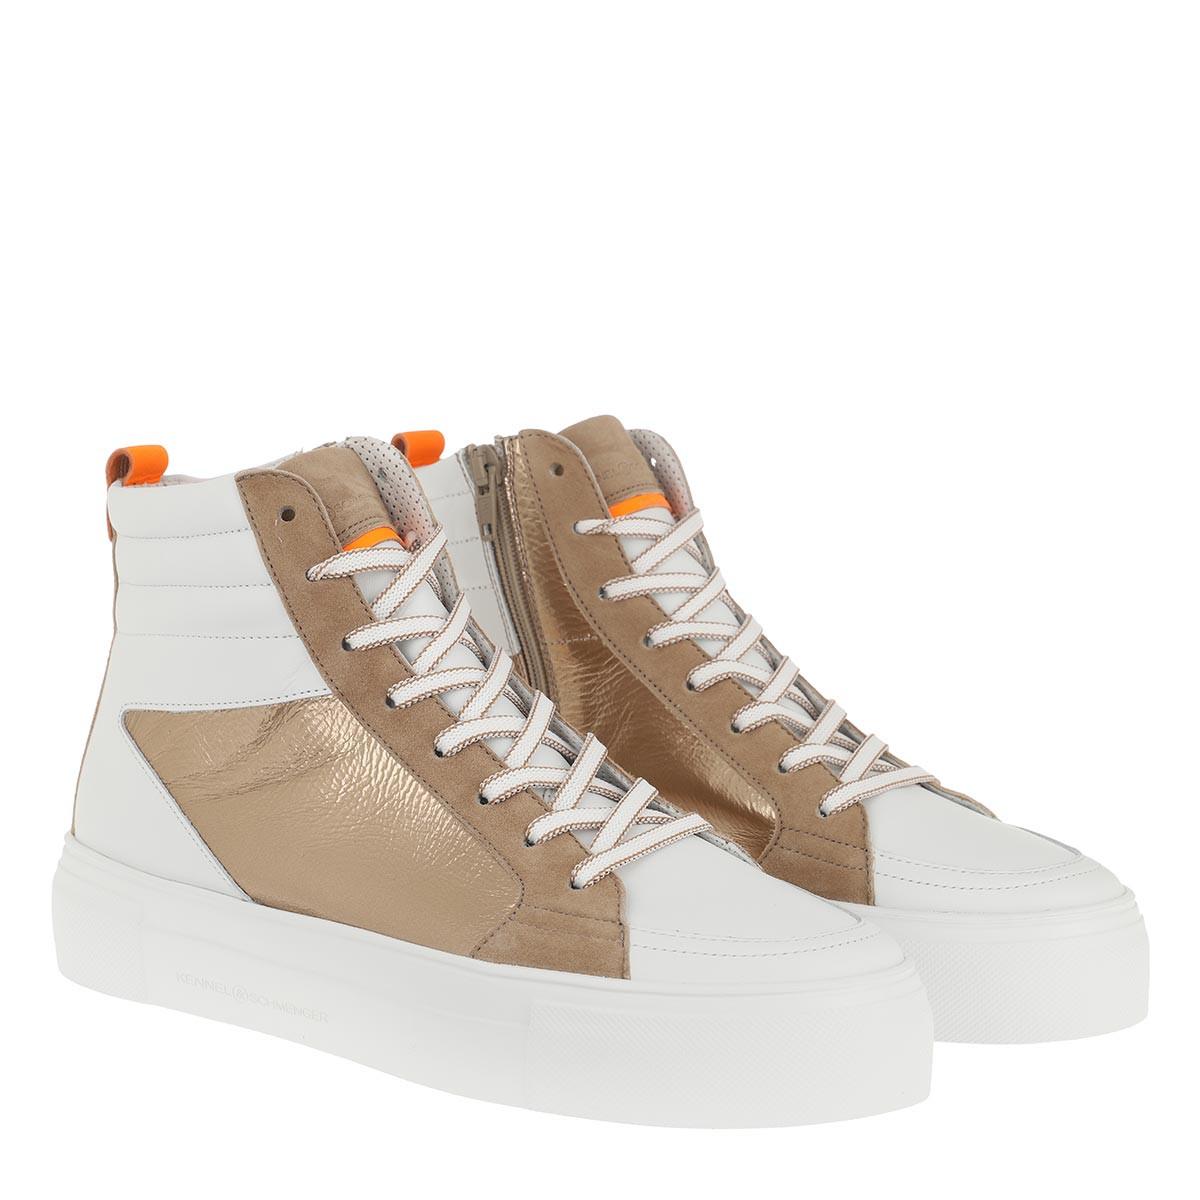 Kennel & Schmenger Sneakers - Big High Top Sneaker White/Gold - in bunt - für Damen